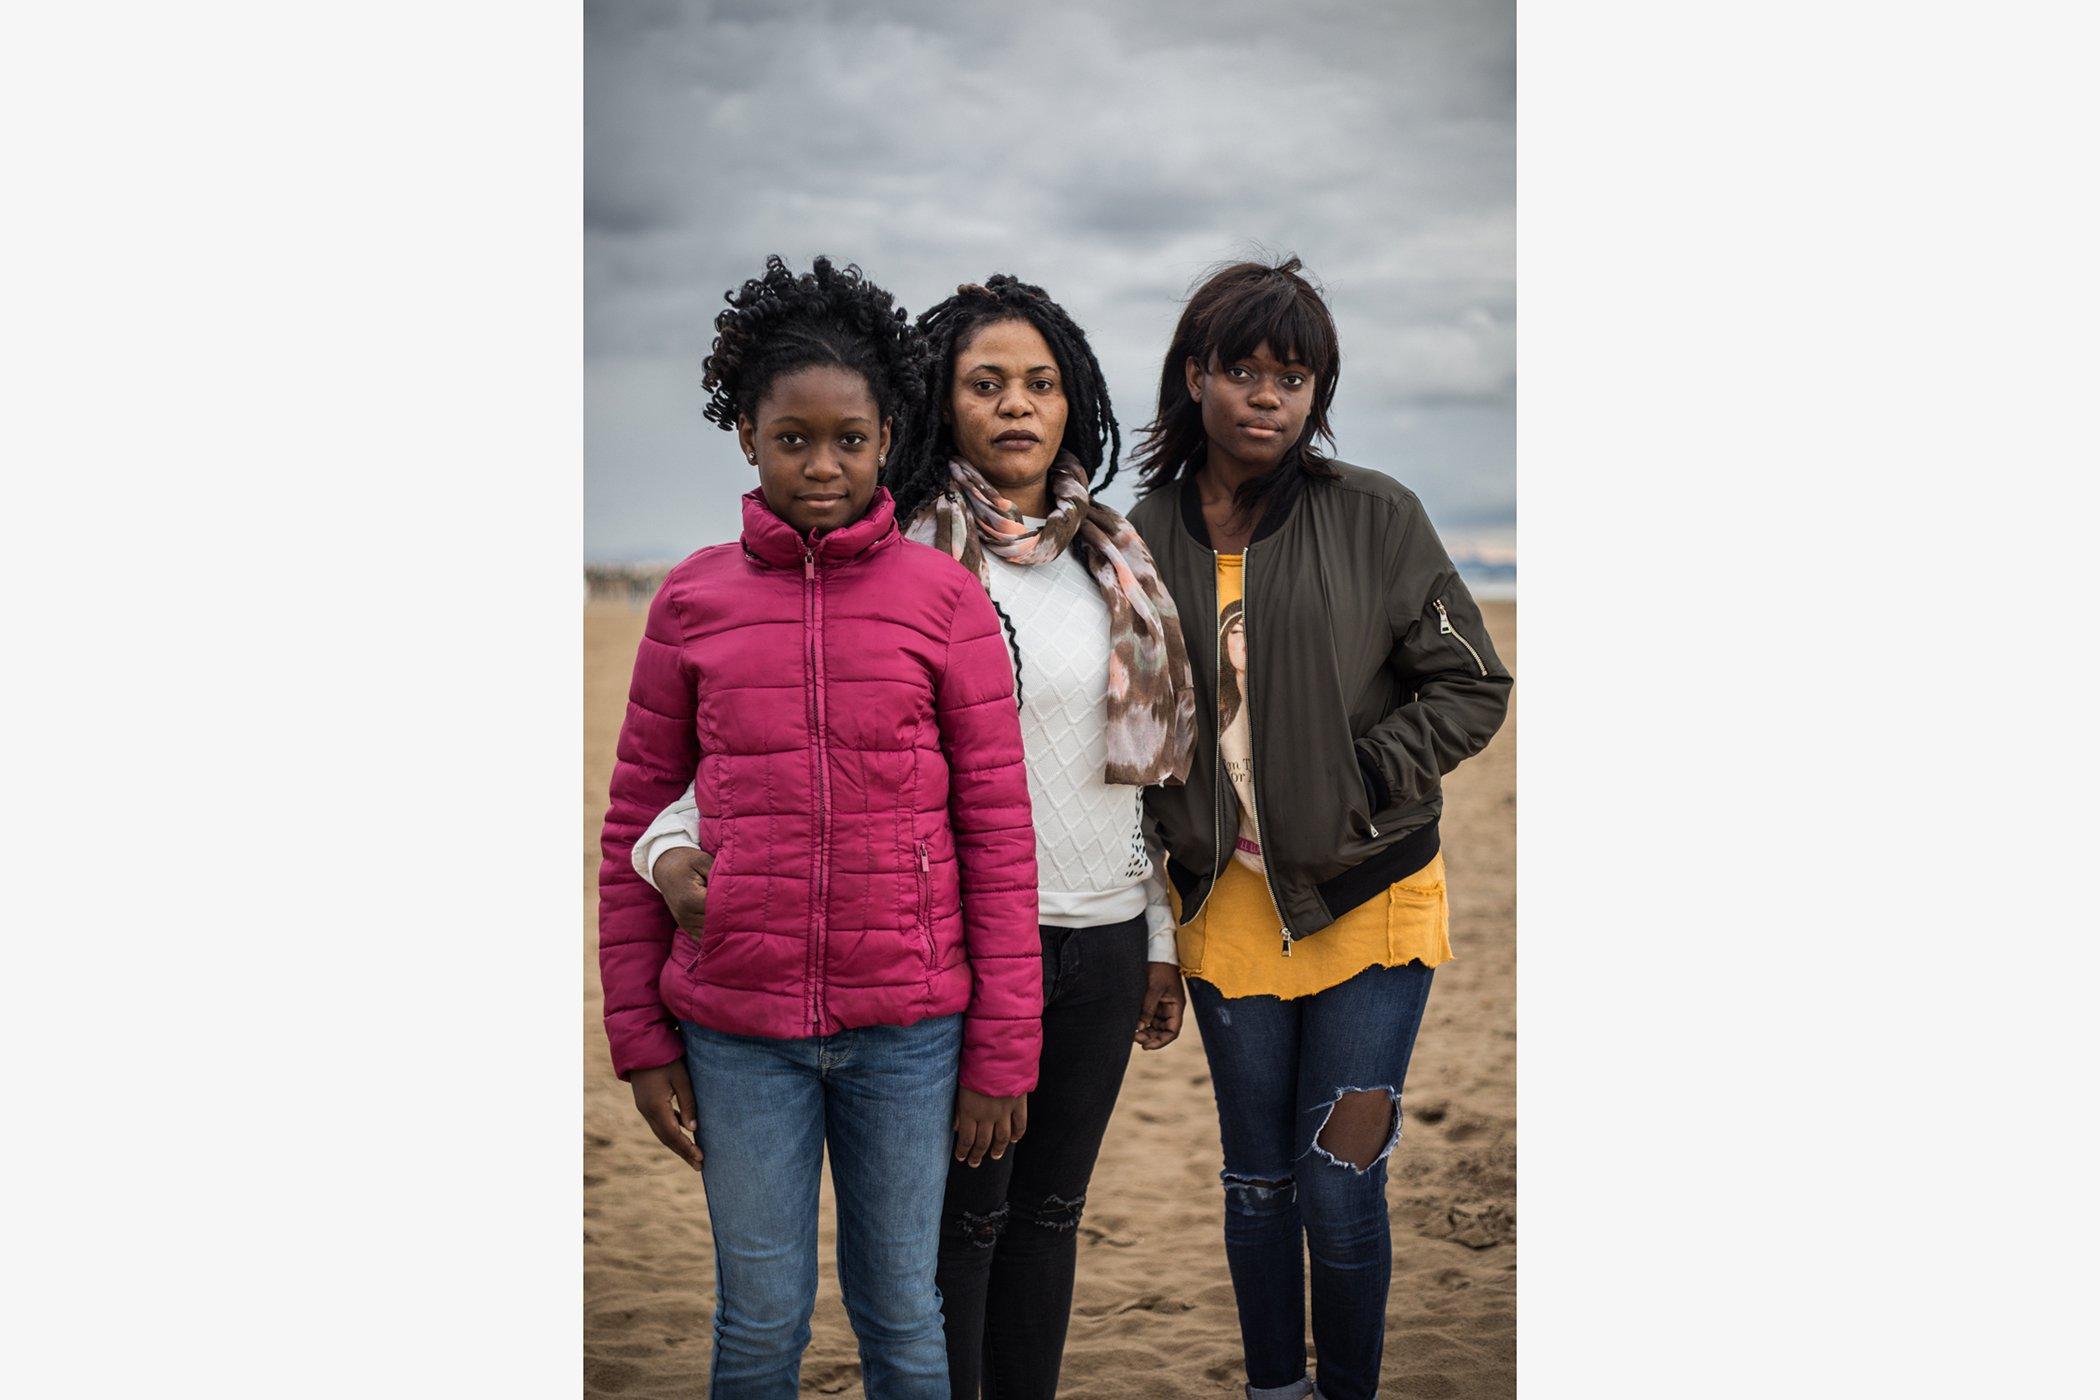 Vivian-Refugees-Stories-007.jpg